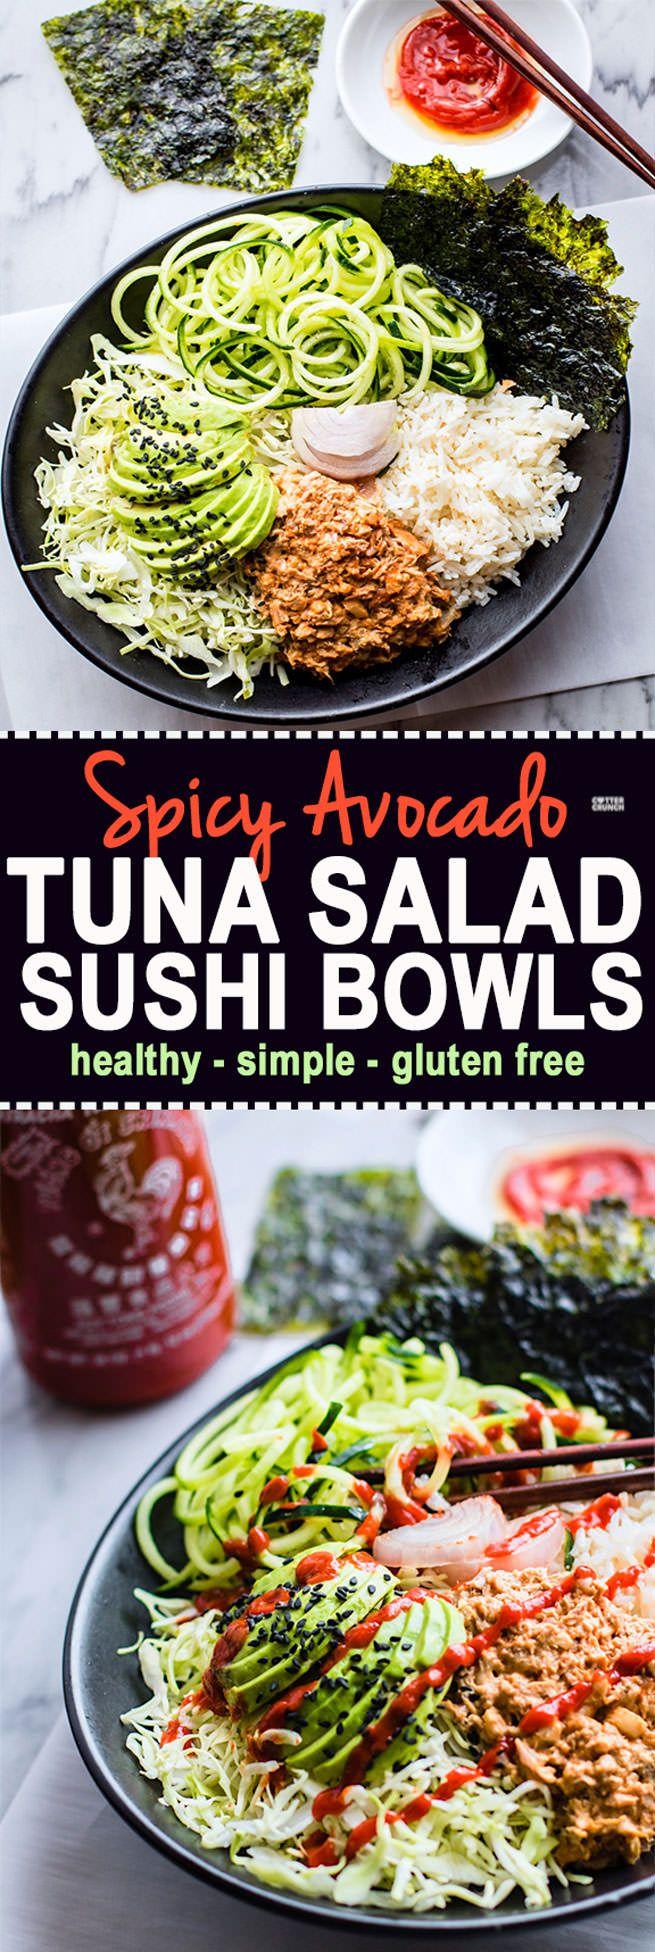 Healthy Spicy Avocado Tuna Salad Sushi Bowls {Gluten Free, Low Mercury, EASY}